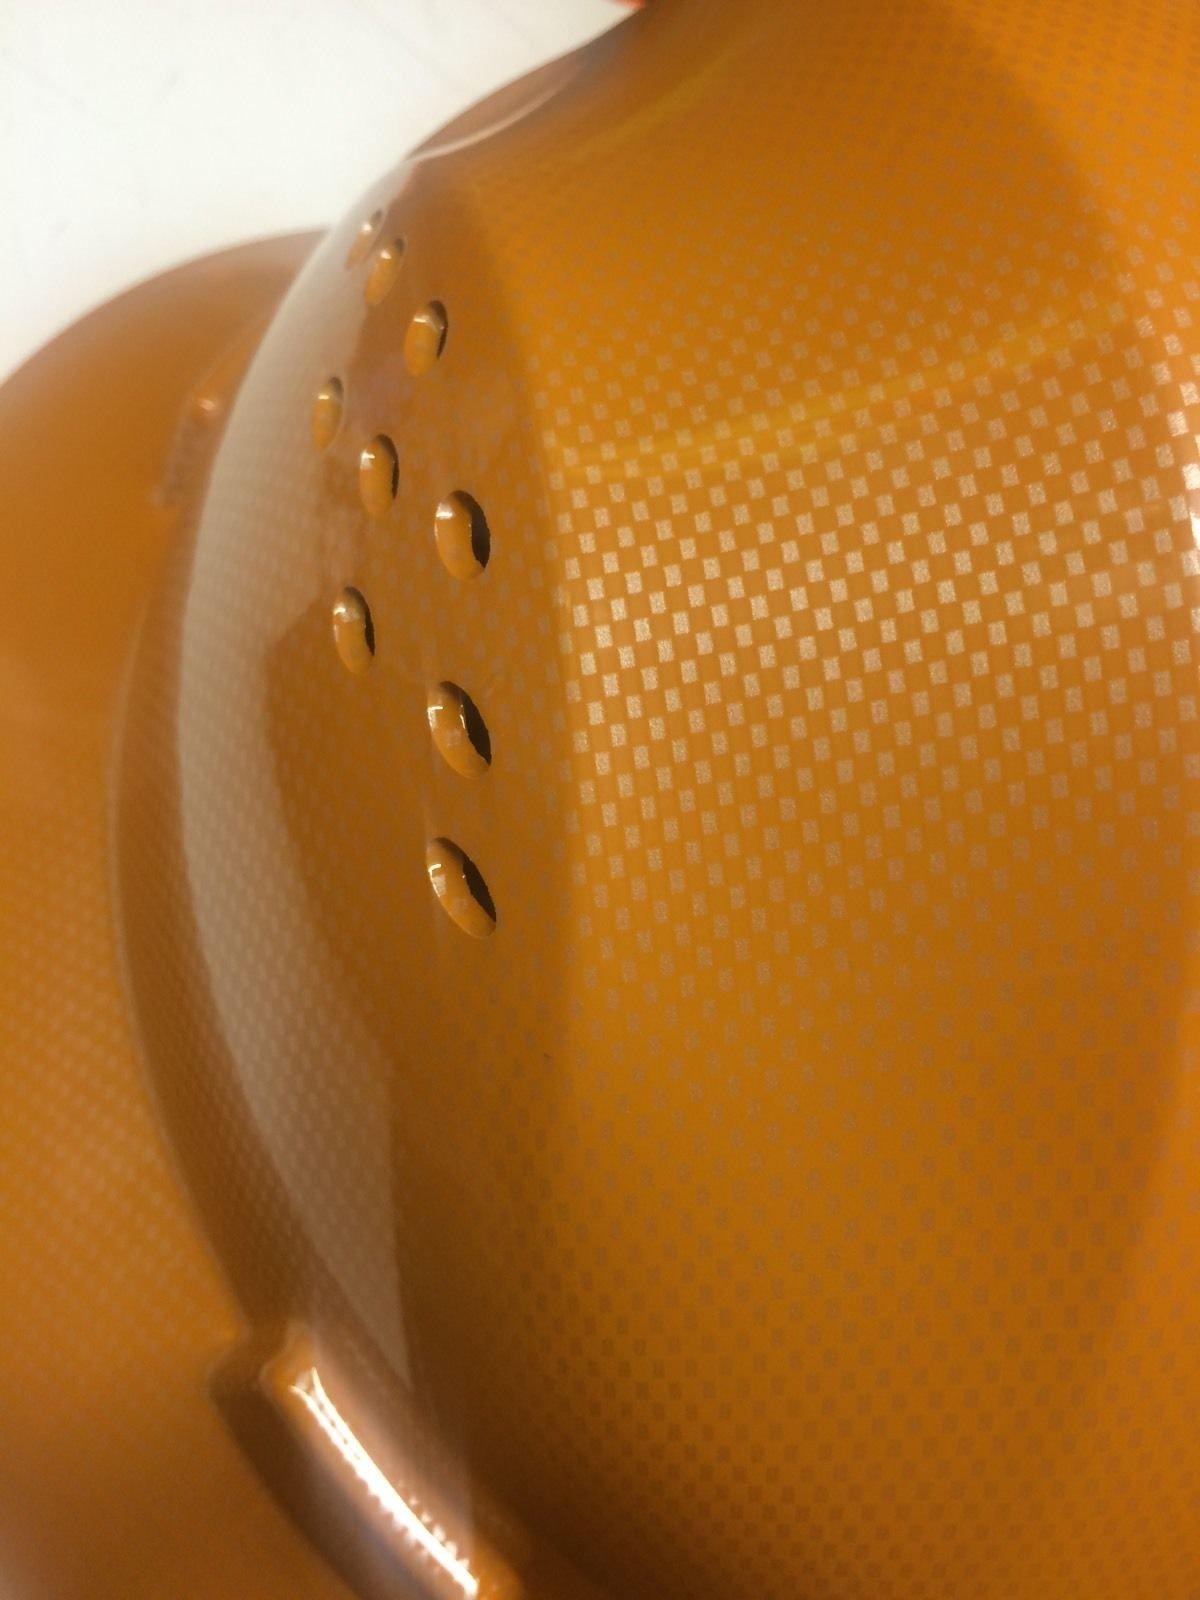 HNTE-TAN Fiberglass Hard Hat Safety Full Brim Helmet, Nylon Ratchet Suspension, 4-Point, {Top Impact} Safety Hard Hat Cool Air Flow Vent System by Truecrest Safety Helmet (Image #3)